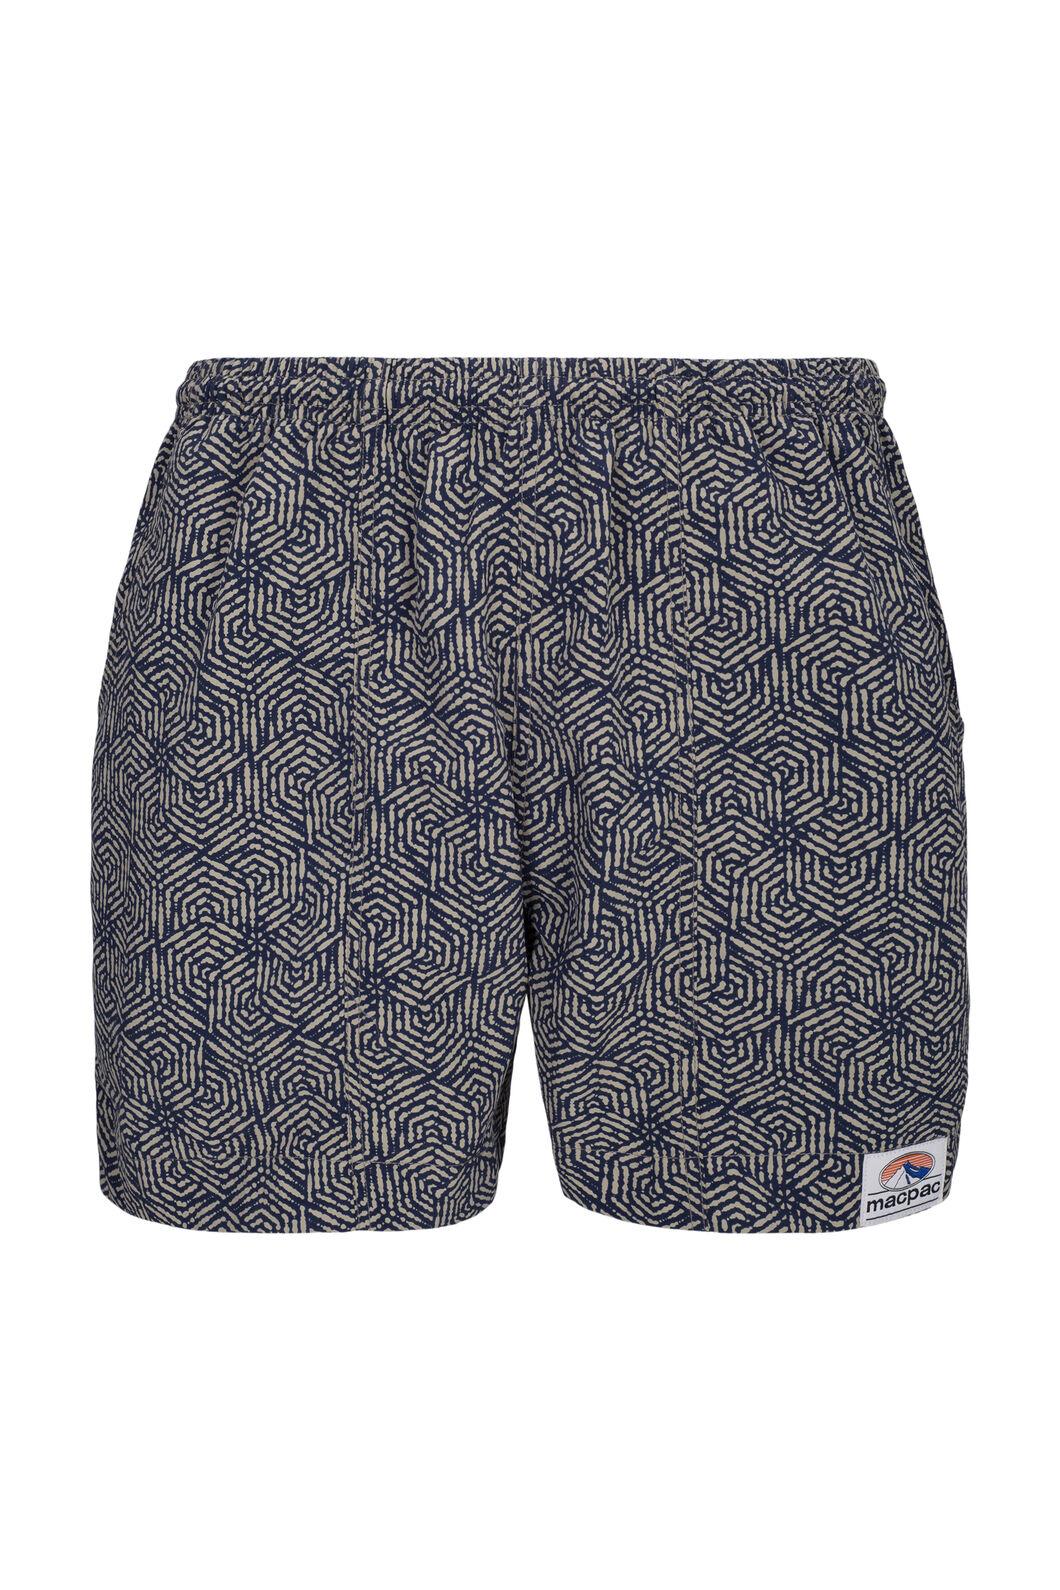 Macpac Winger Shorts — Men's, Khaki Print, hi-res